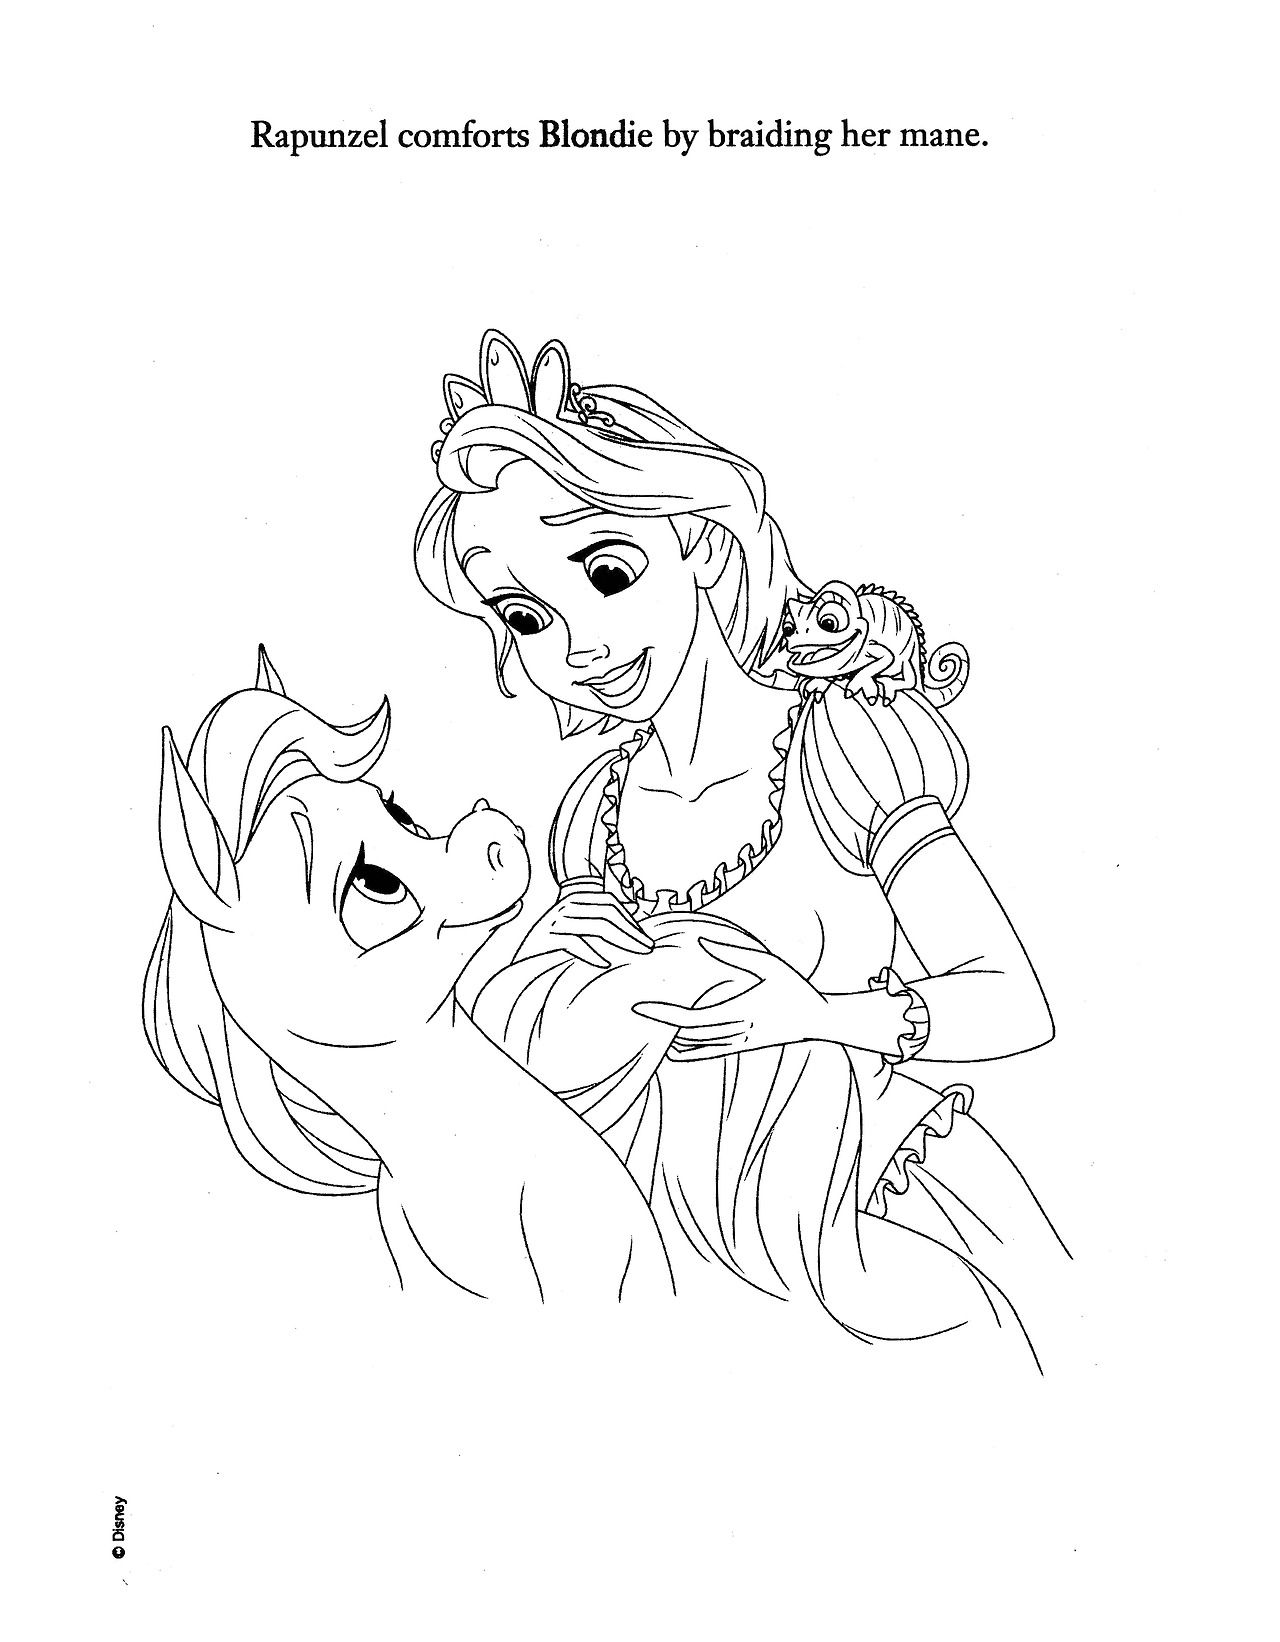 Disney princess palace pets coloring pages - Disney Princess Palace Pets Sweet And Spunky Blondie S Story 10 13